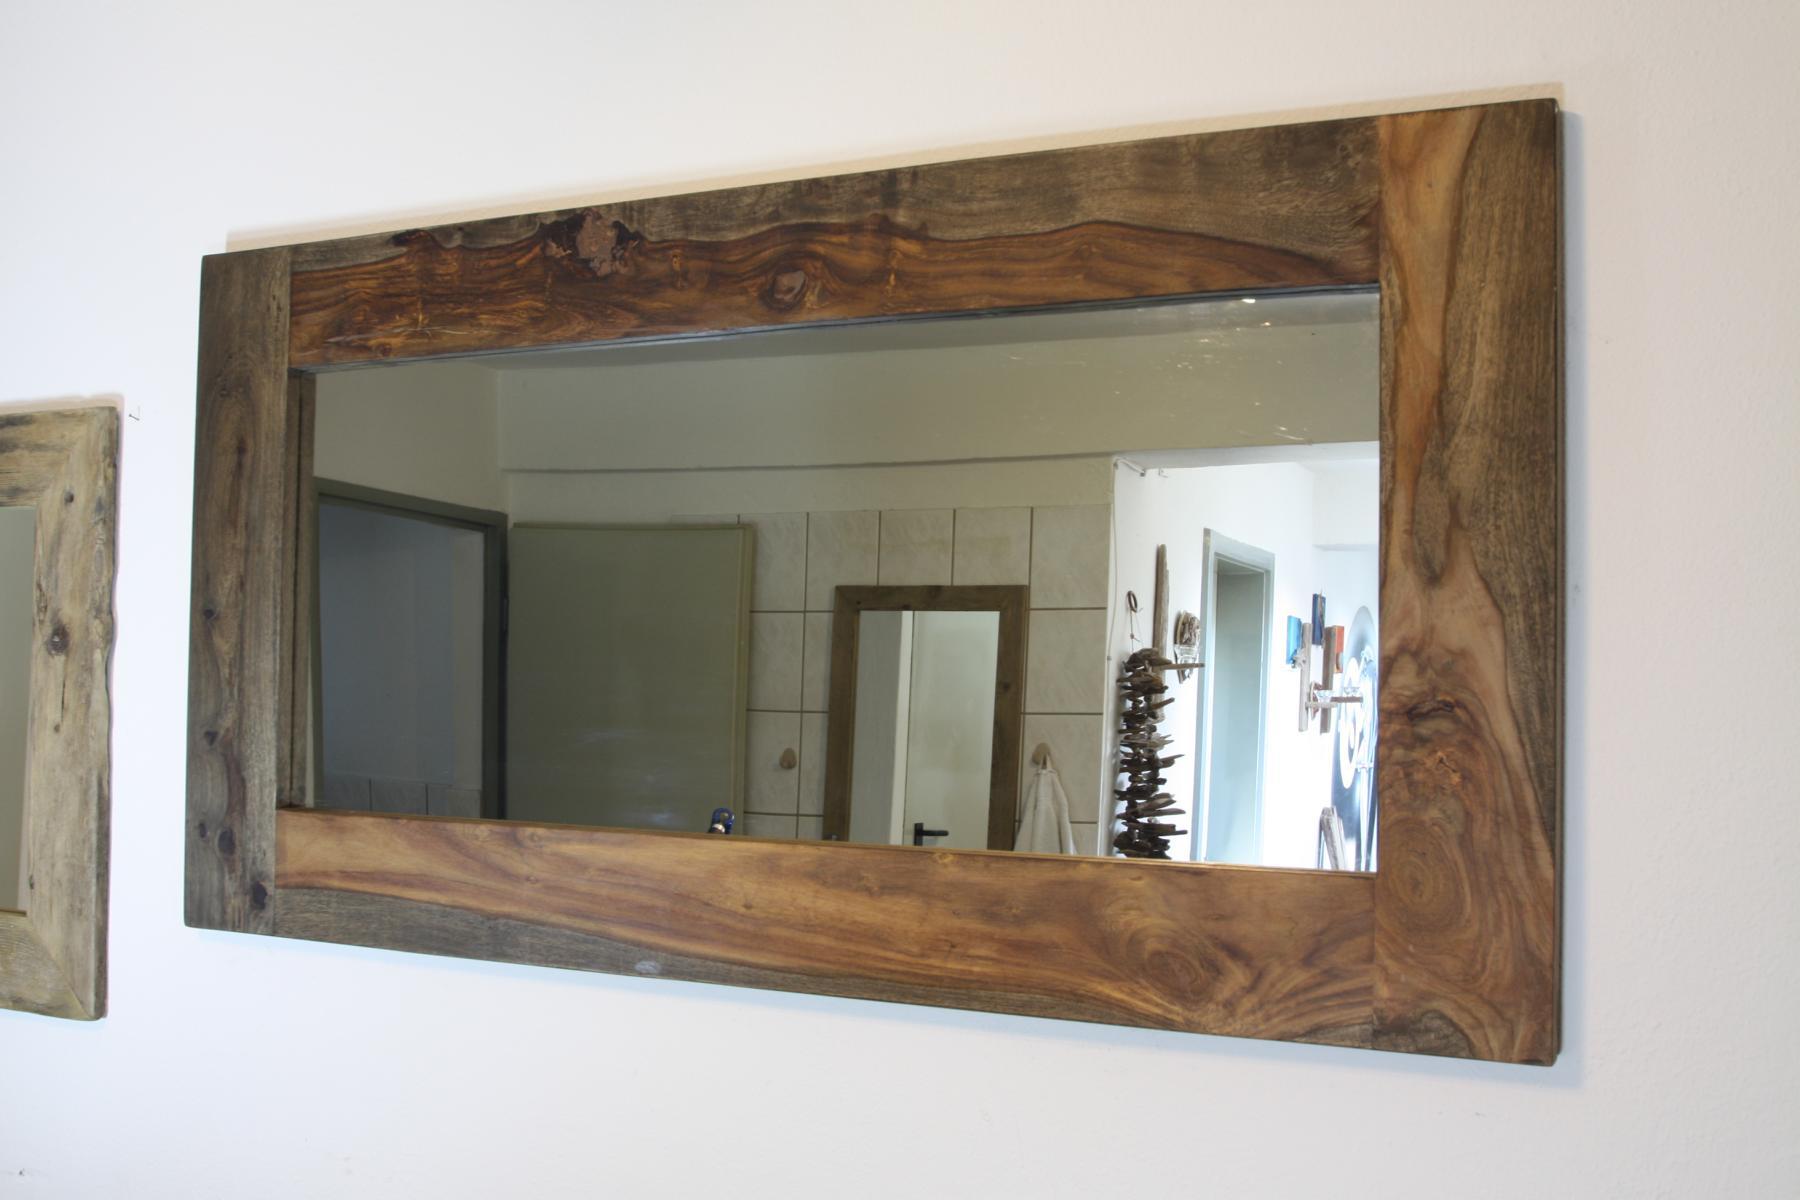 Altholz Spiegel Online Kaufen Wwwtreibholz Bodenseede Holz